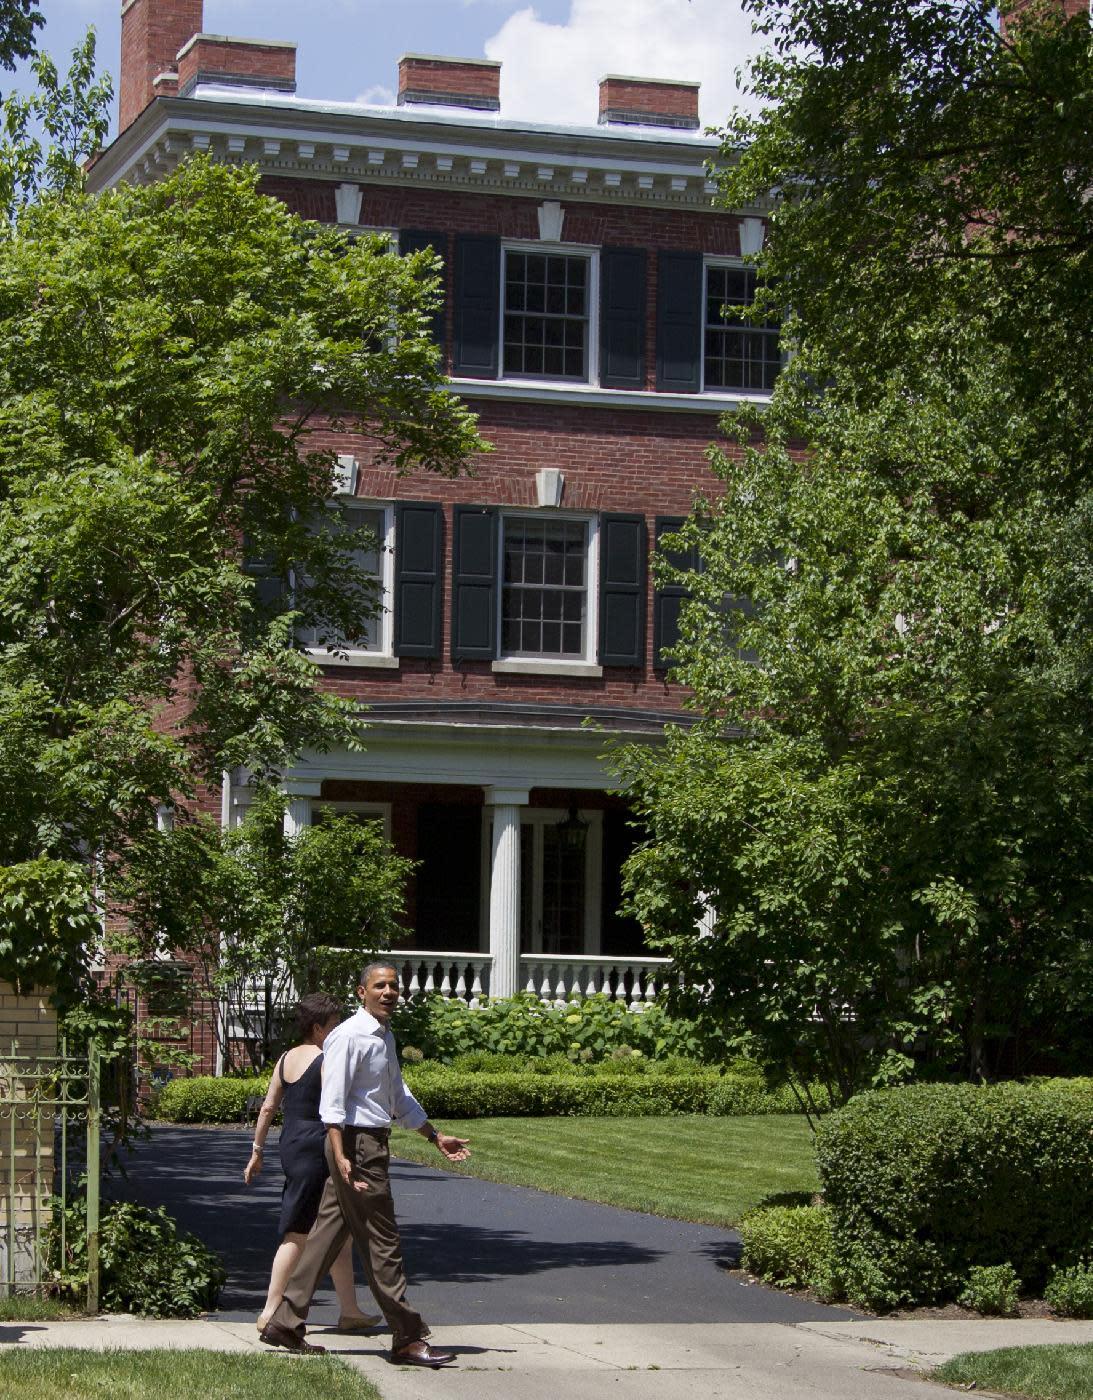 President Barack Obama walks through his Hyde Park neighborhood with senior advisor Valerie Jarrett to his friend Marty Nesbitt's home, Saturday, June 2, 2012, in Chicago. (AP Photo/Carolyn Kaster)